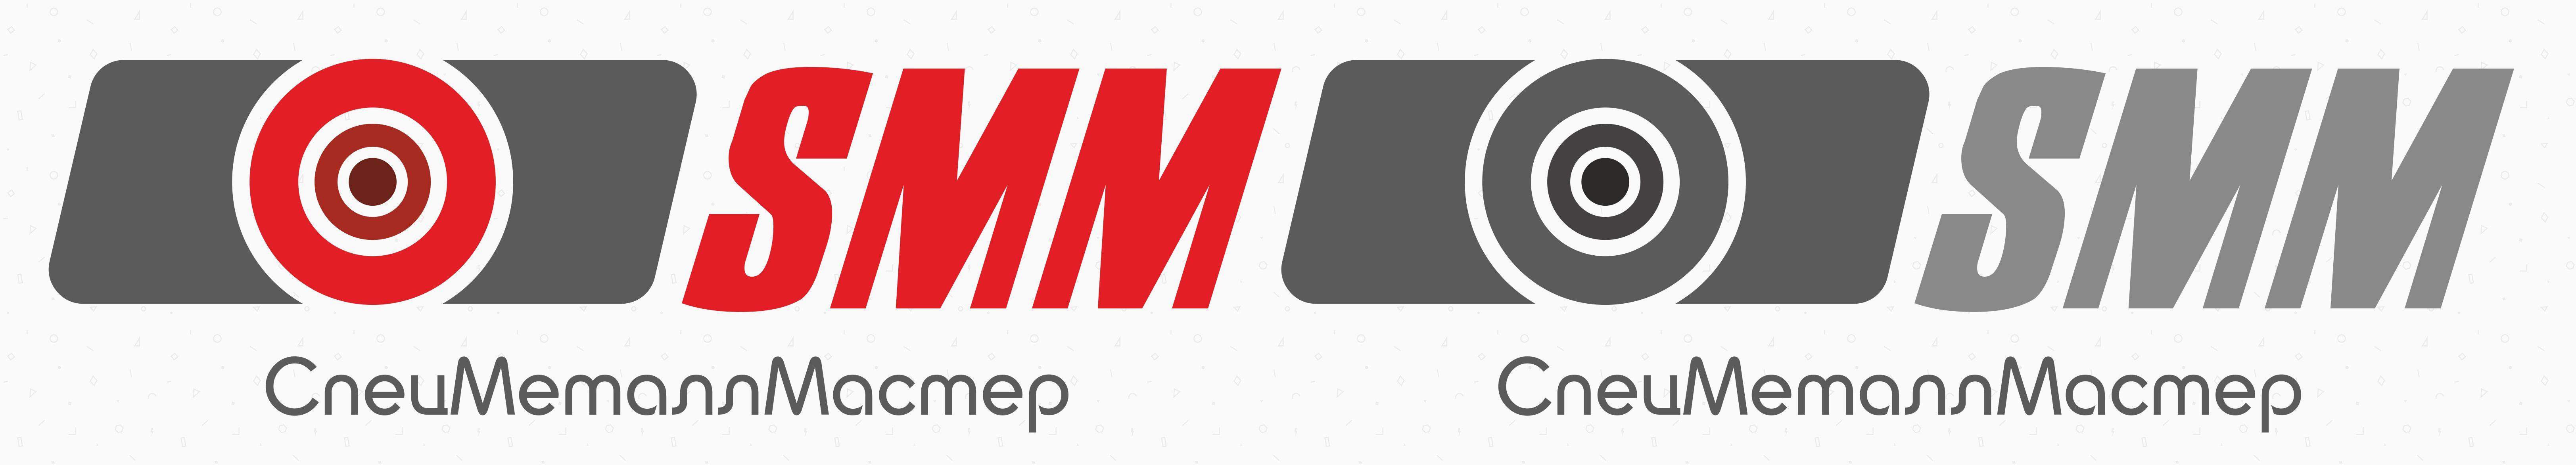 Логотип для металлургической компании - дизайнер KeepBalance